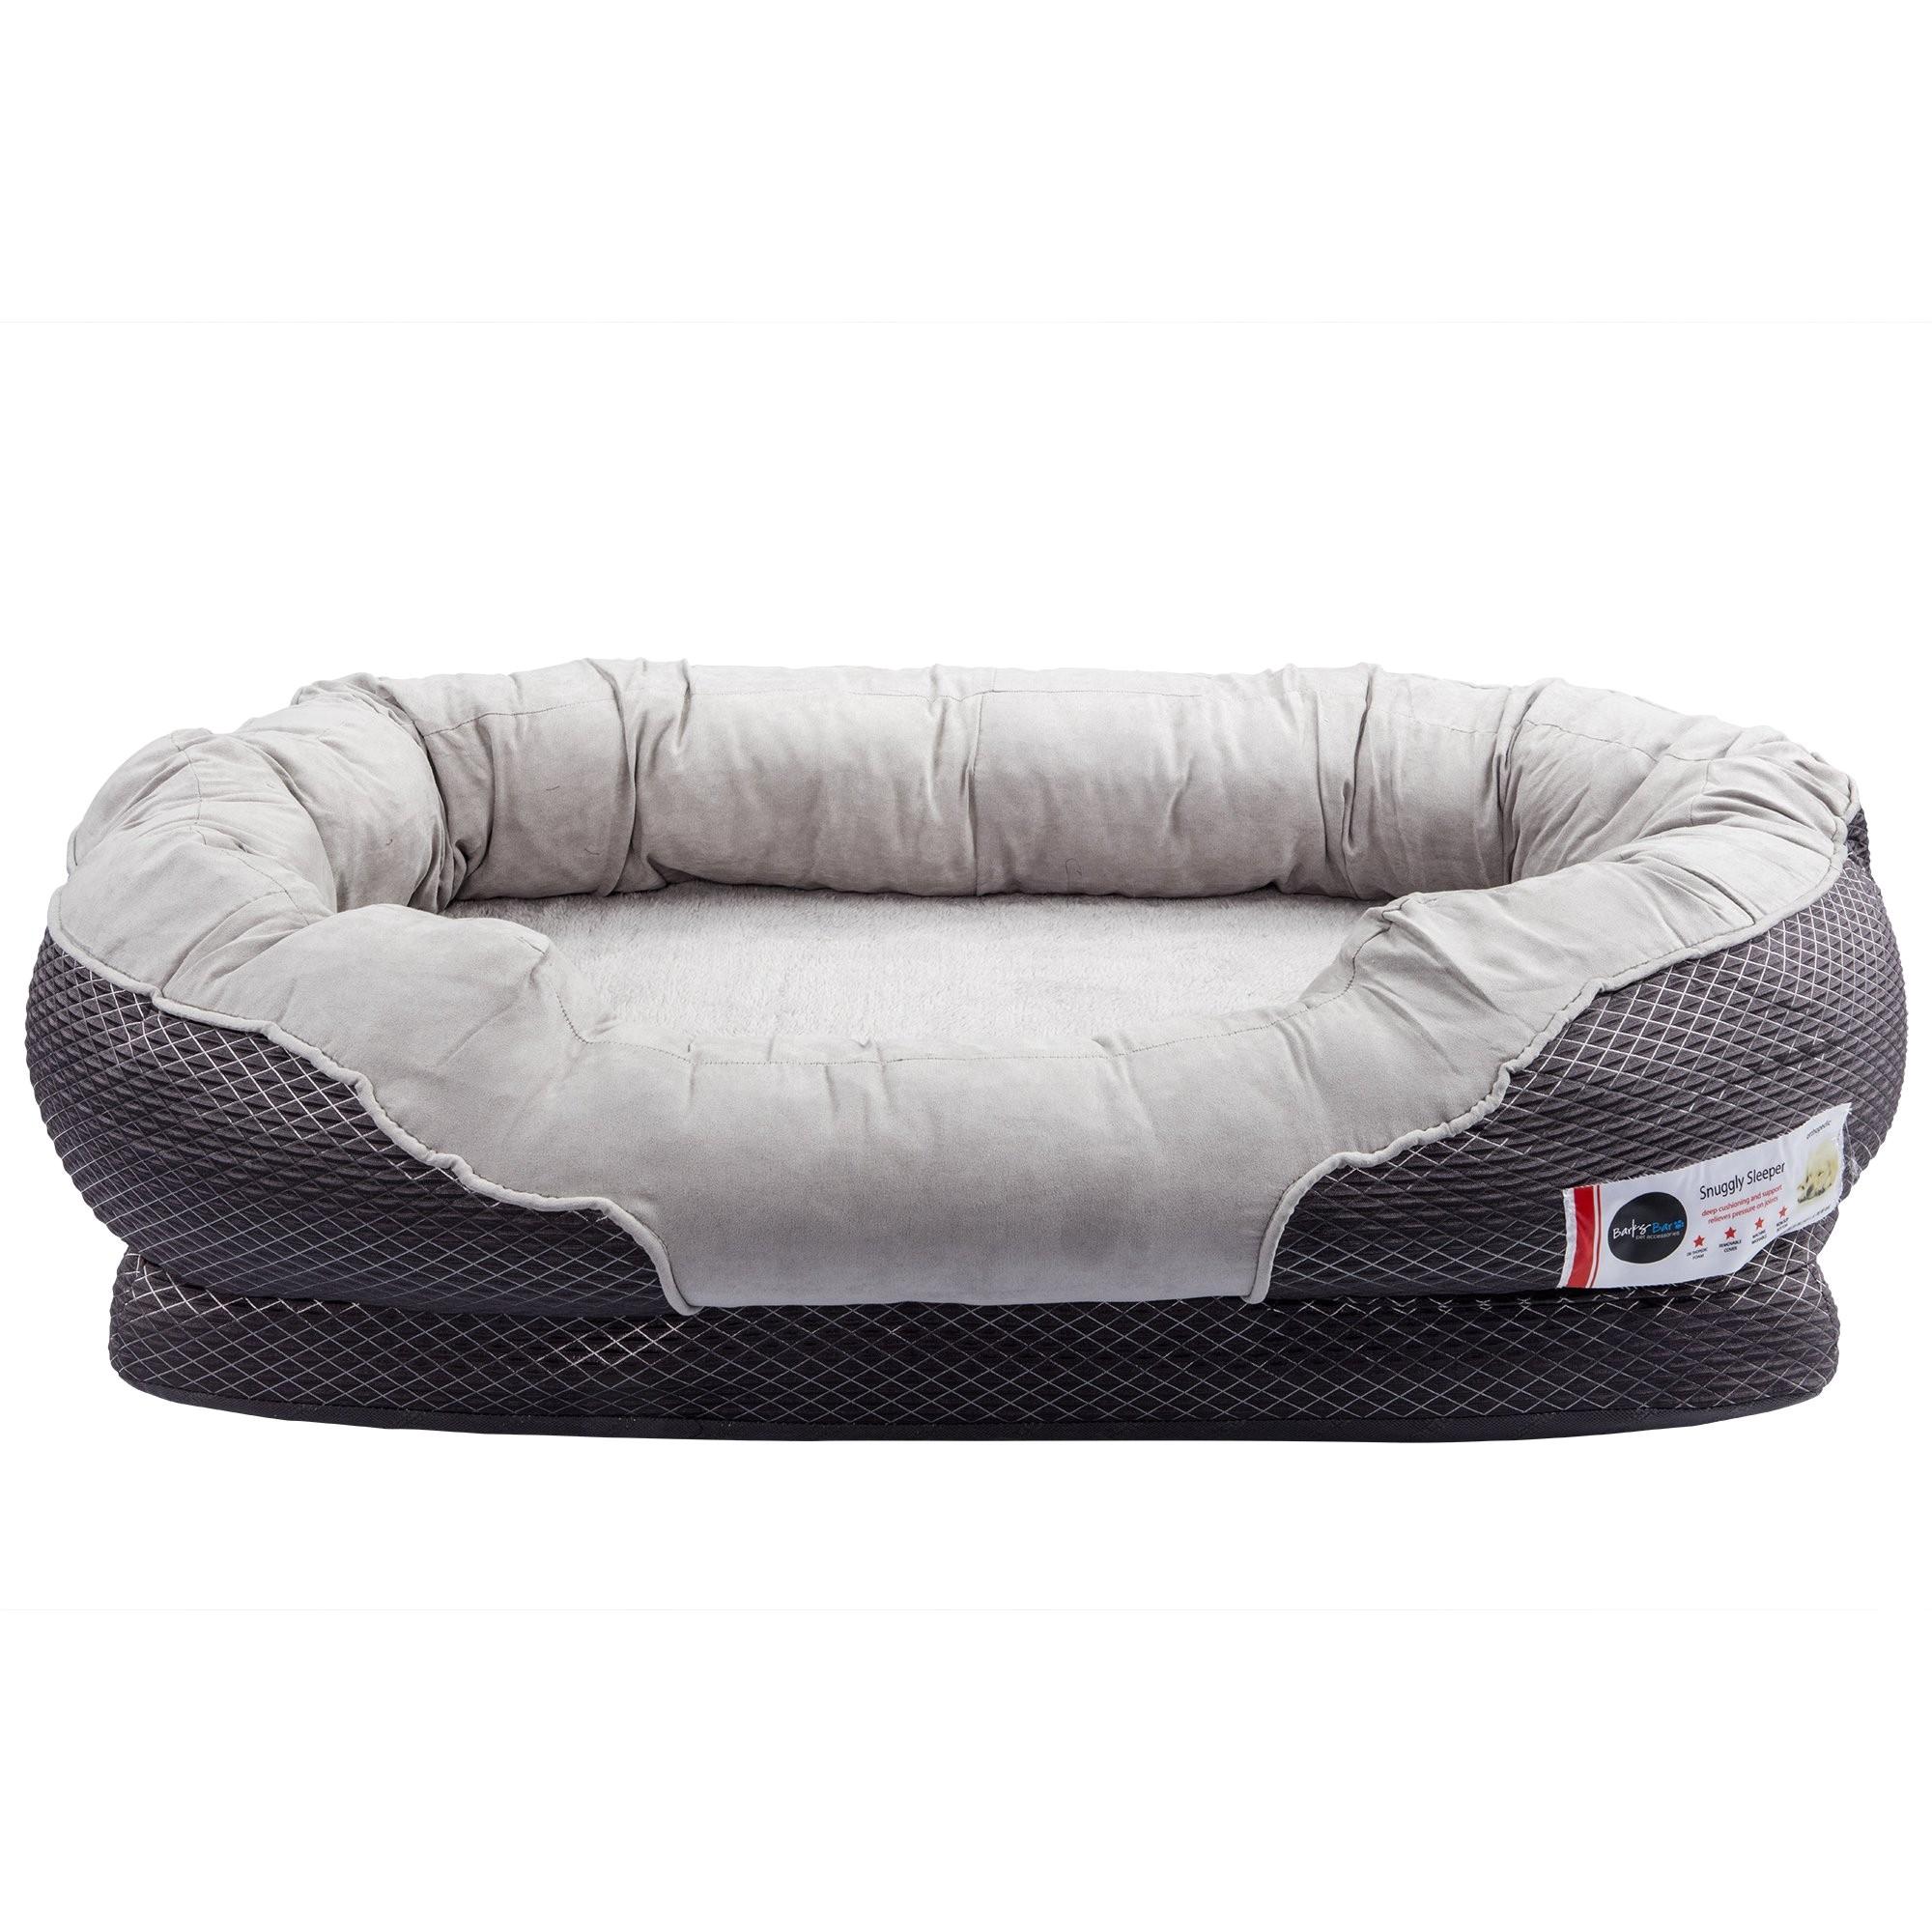 barksbar large gray orthopedic dog bed 40 x 30 inches snuggly sleeper with nonslip orthopedic foam